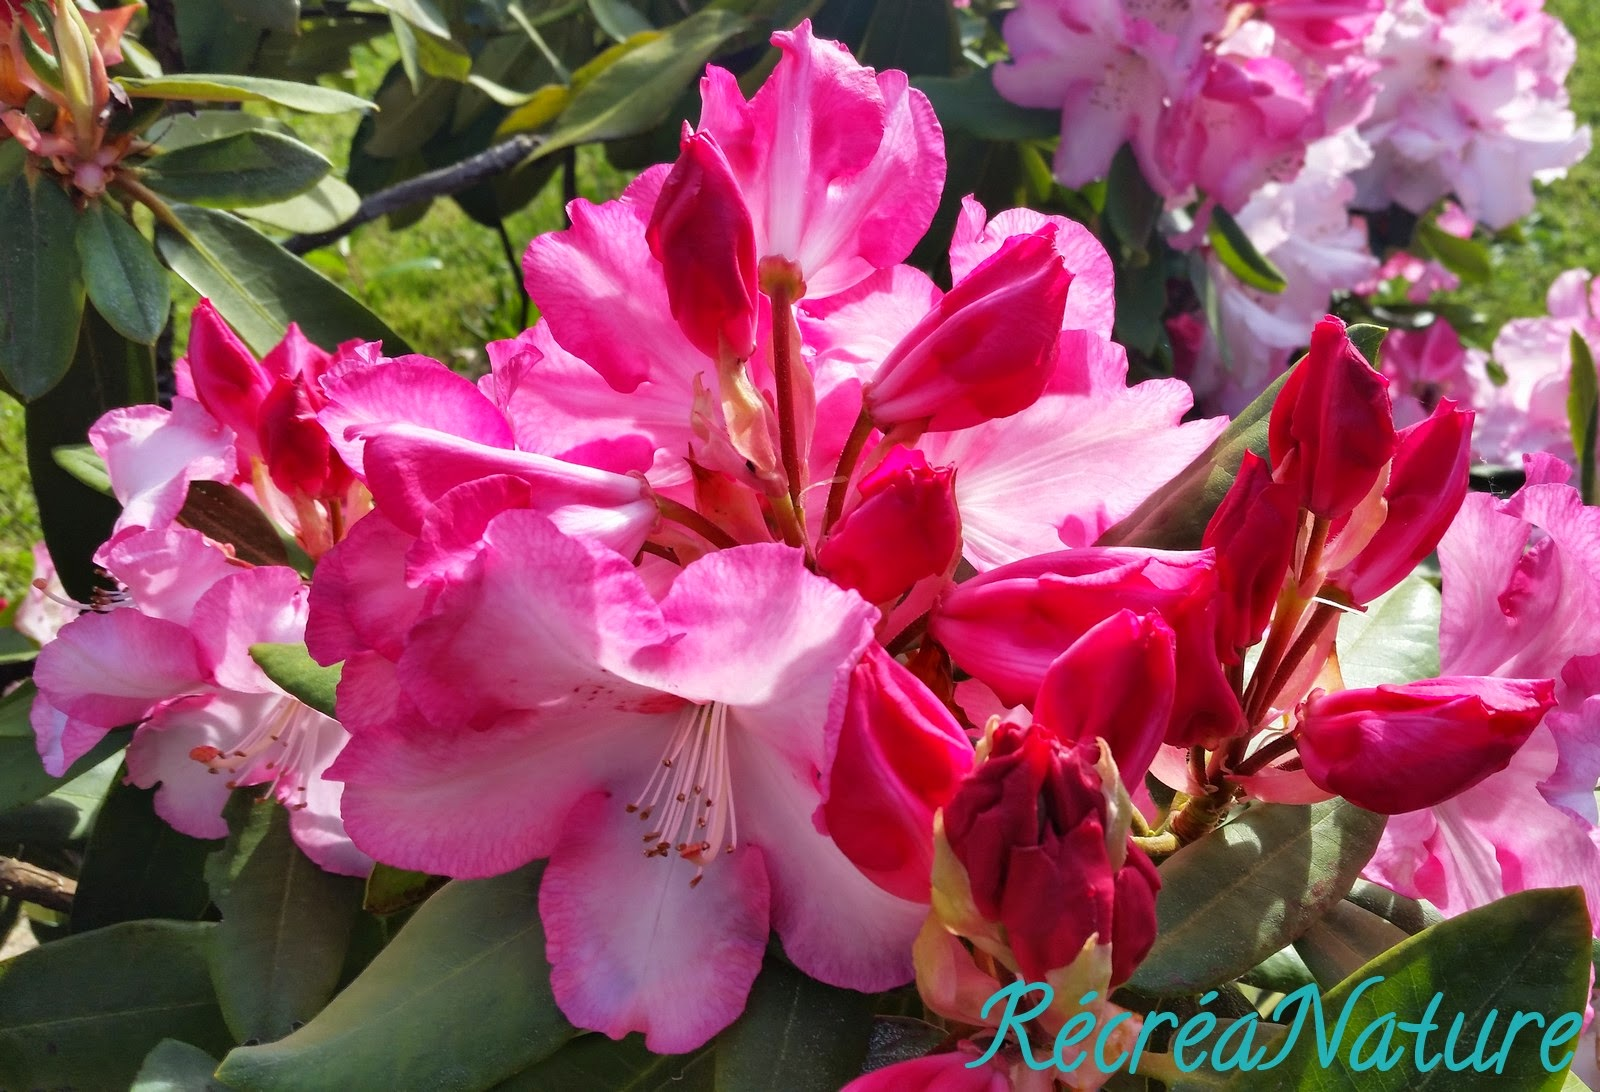 Mon jardin en mai 1 fleur de rhododendron rose - Rhododendron ne fleurit pas ...